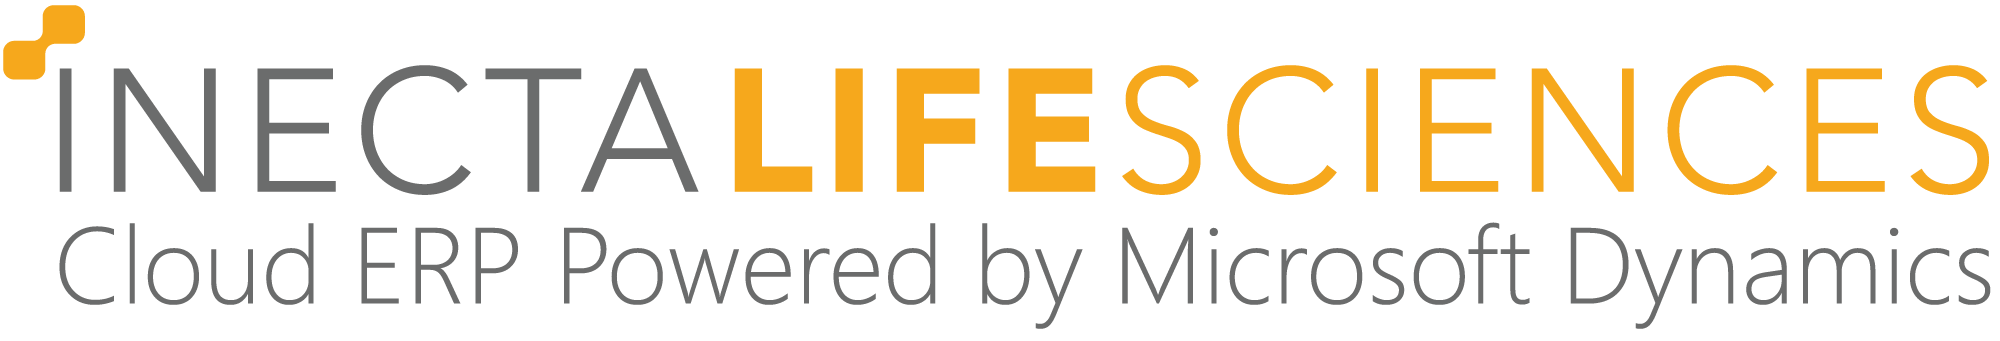 Lifesciences-logo-no-icon-with-slogan-cropped-v3